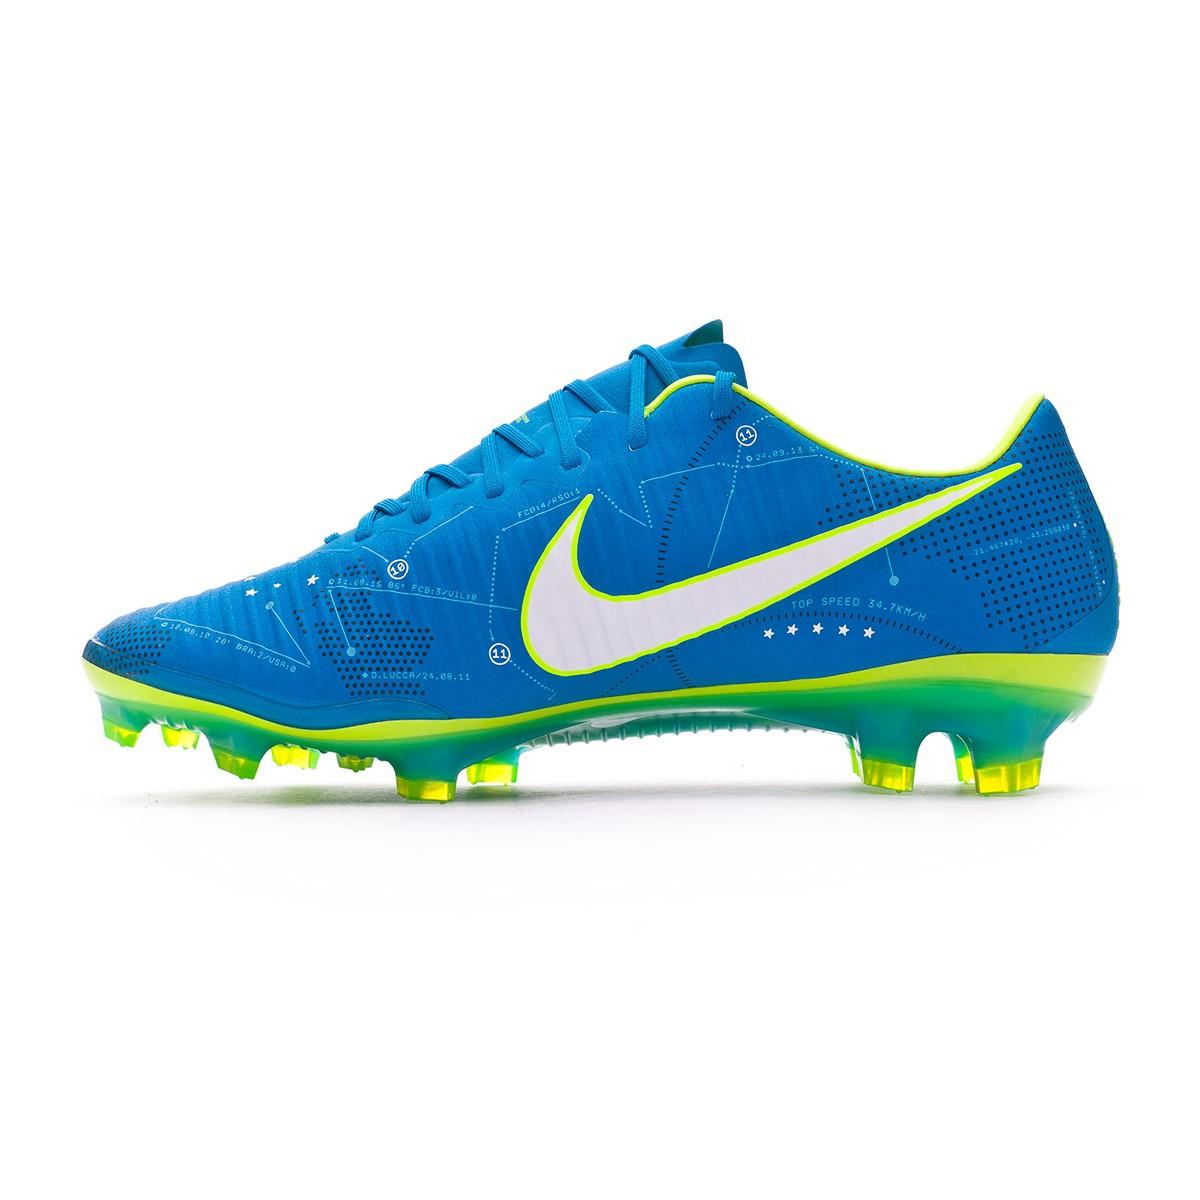 654ec2537ef2 Football Boots Nike Mercurial Vapor XI ACC FG Neymar Blue orbit-White-Armory  navy - Tienda de fútbol Fútbol Emotion